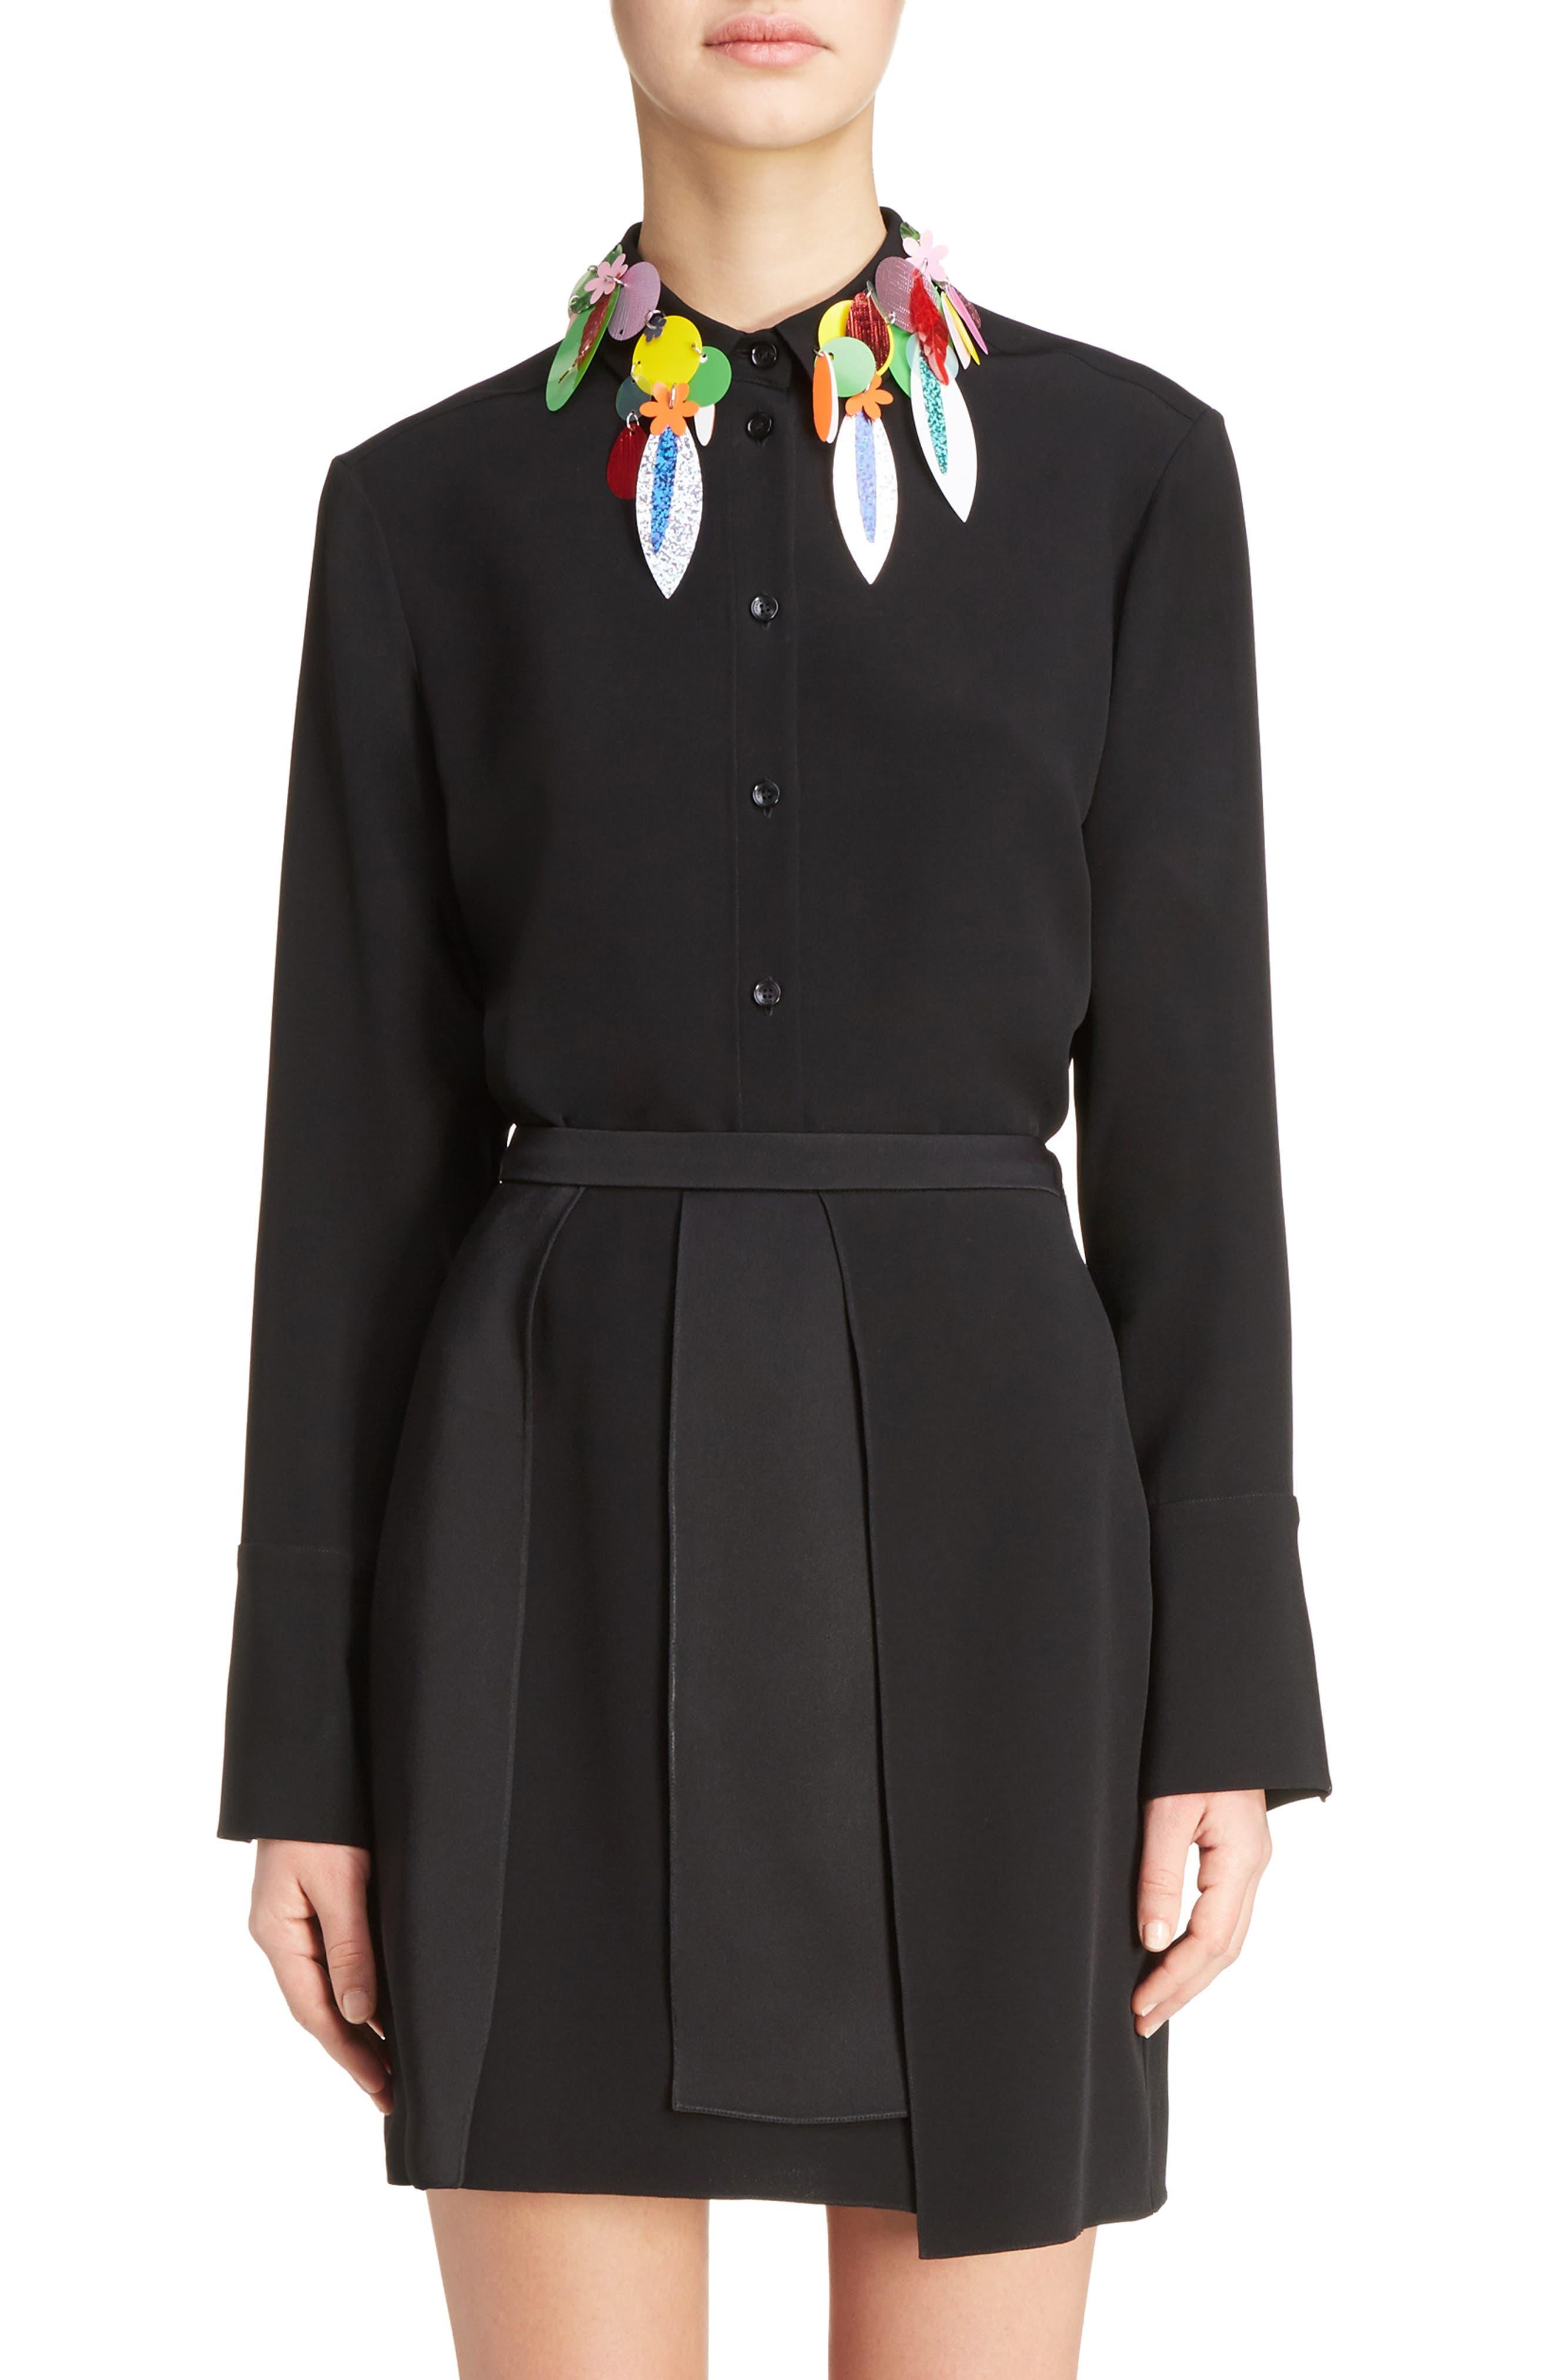 Christopher Kane Sequin Collar Blouse